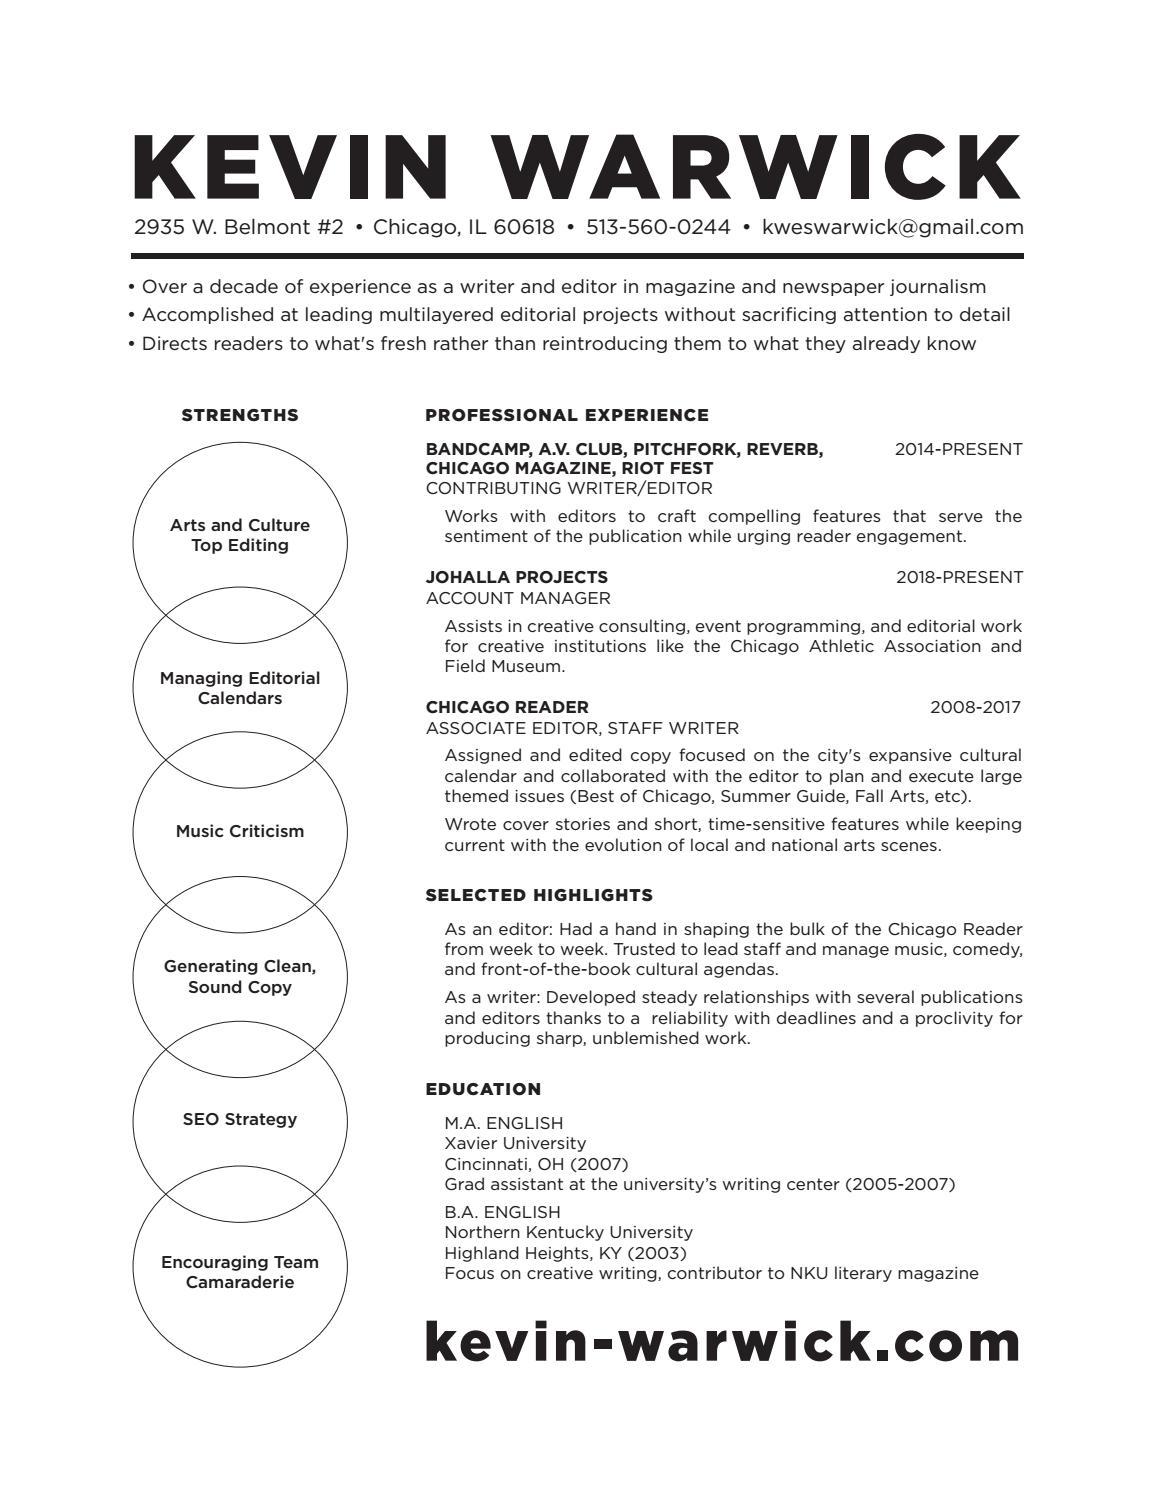 Kevin warwick resume v5b (2) by Kevin Warwick - issuu